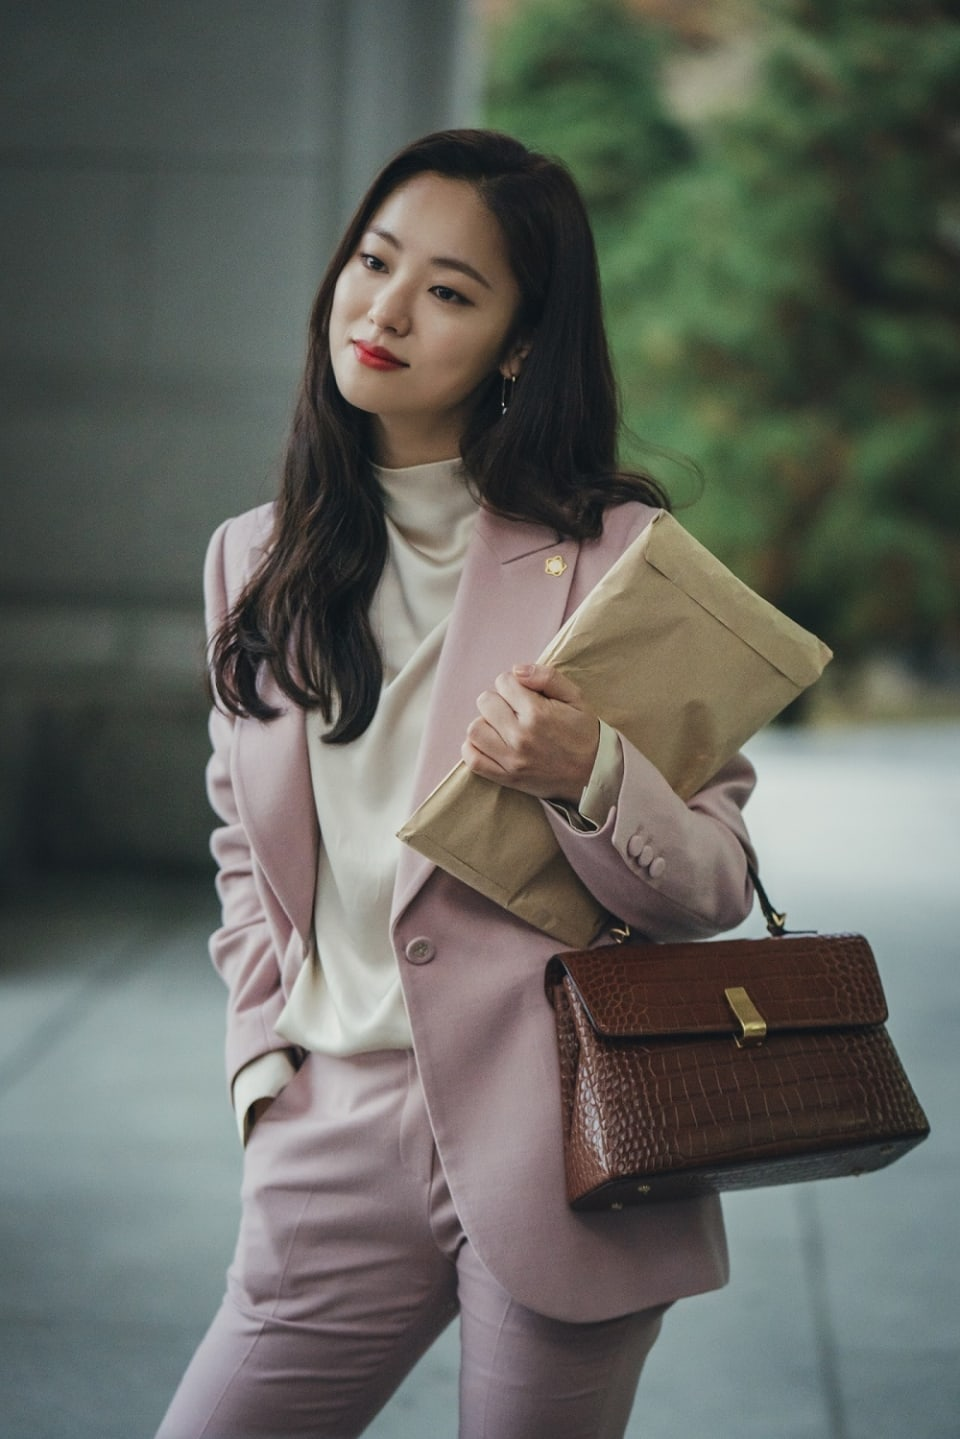 jeon yeo bin vincenzo 1